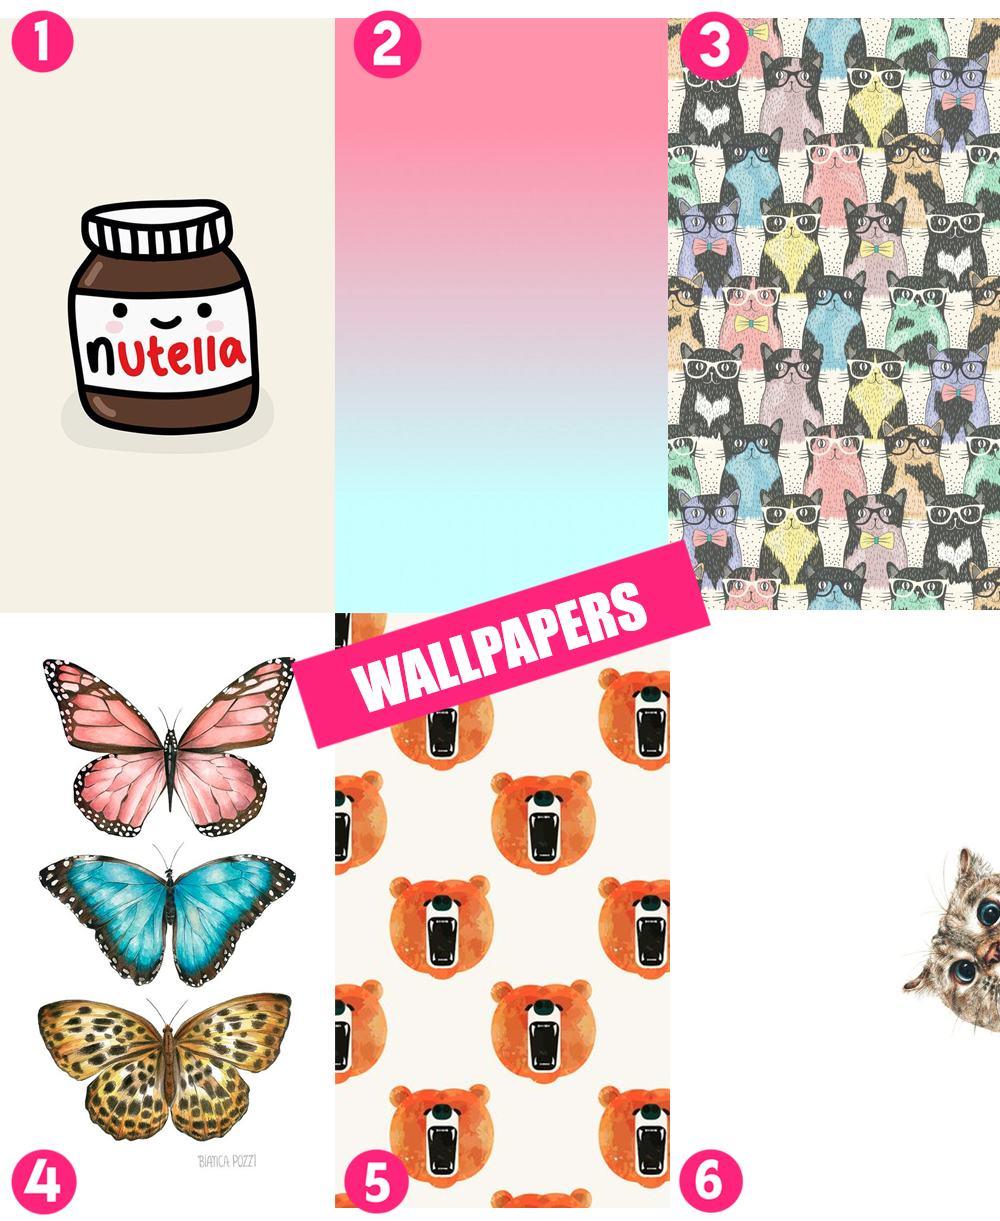 teste_taci_wallpapers3